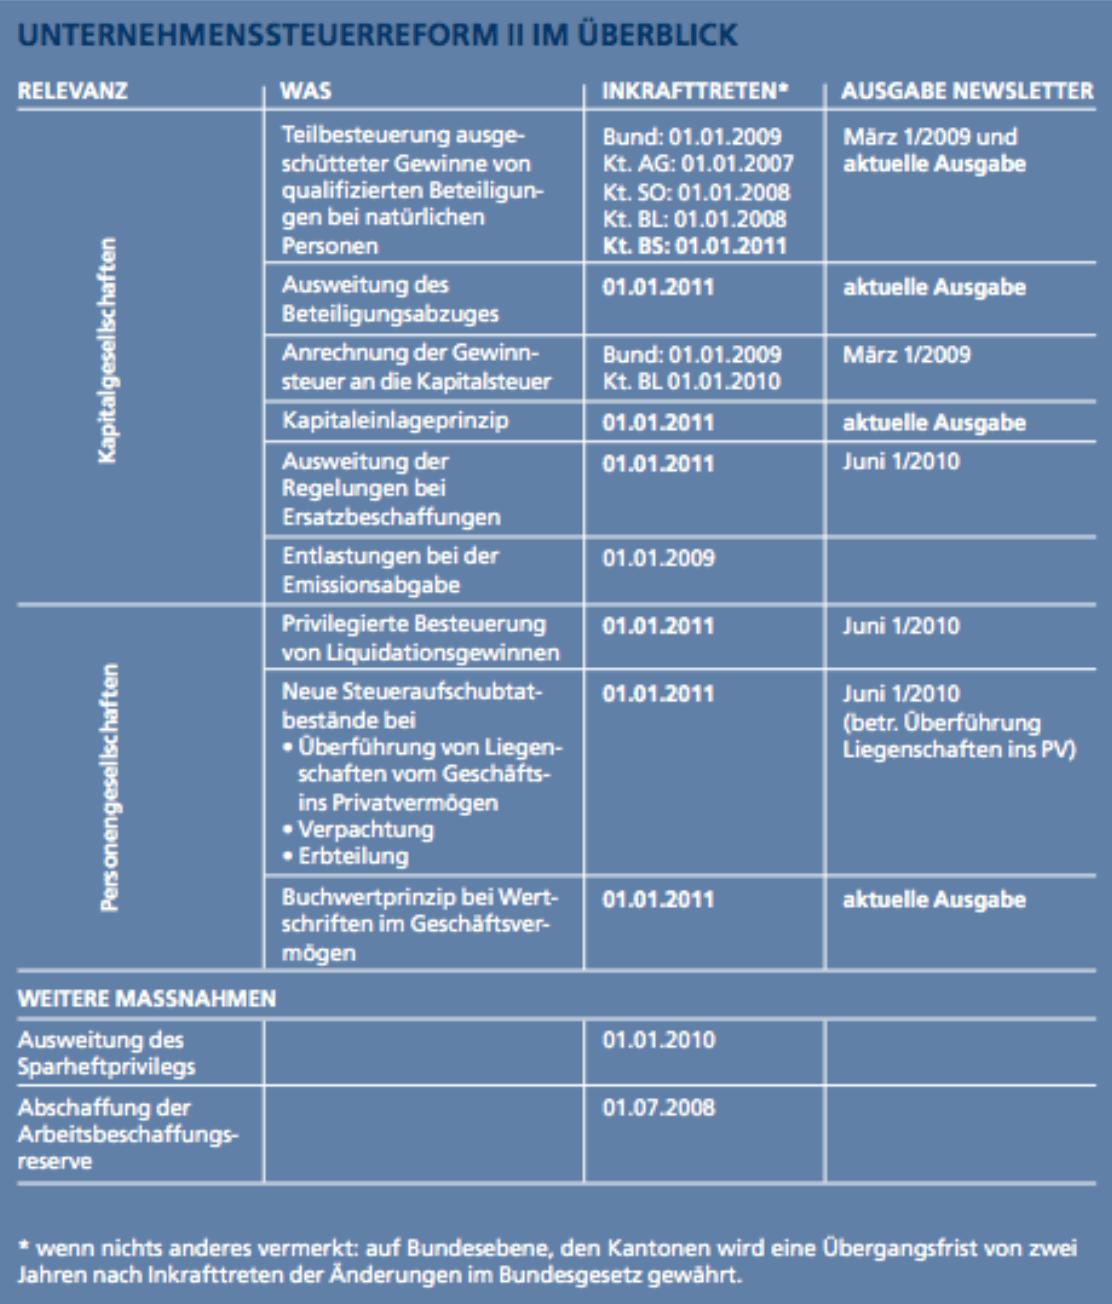 Publikation Unternehmensteuerreform II